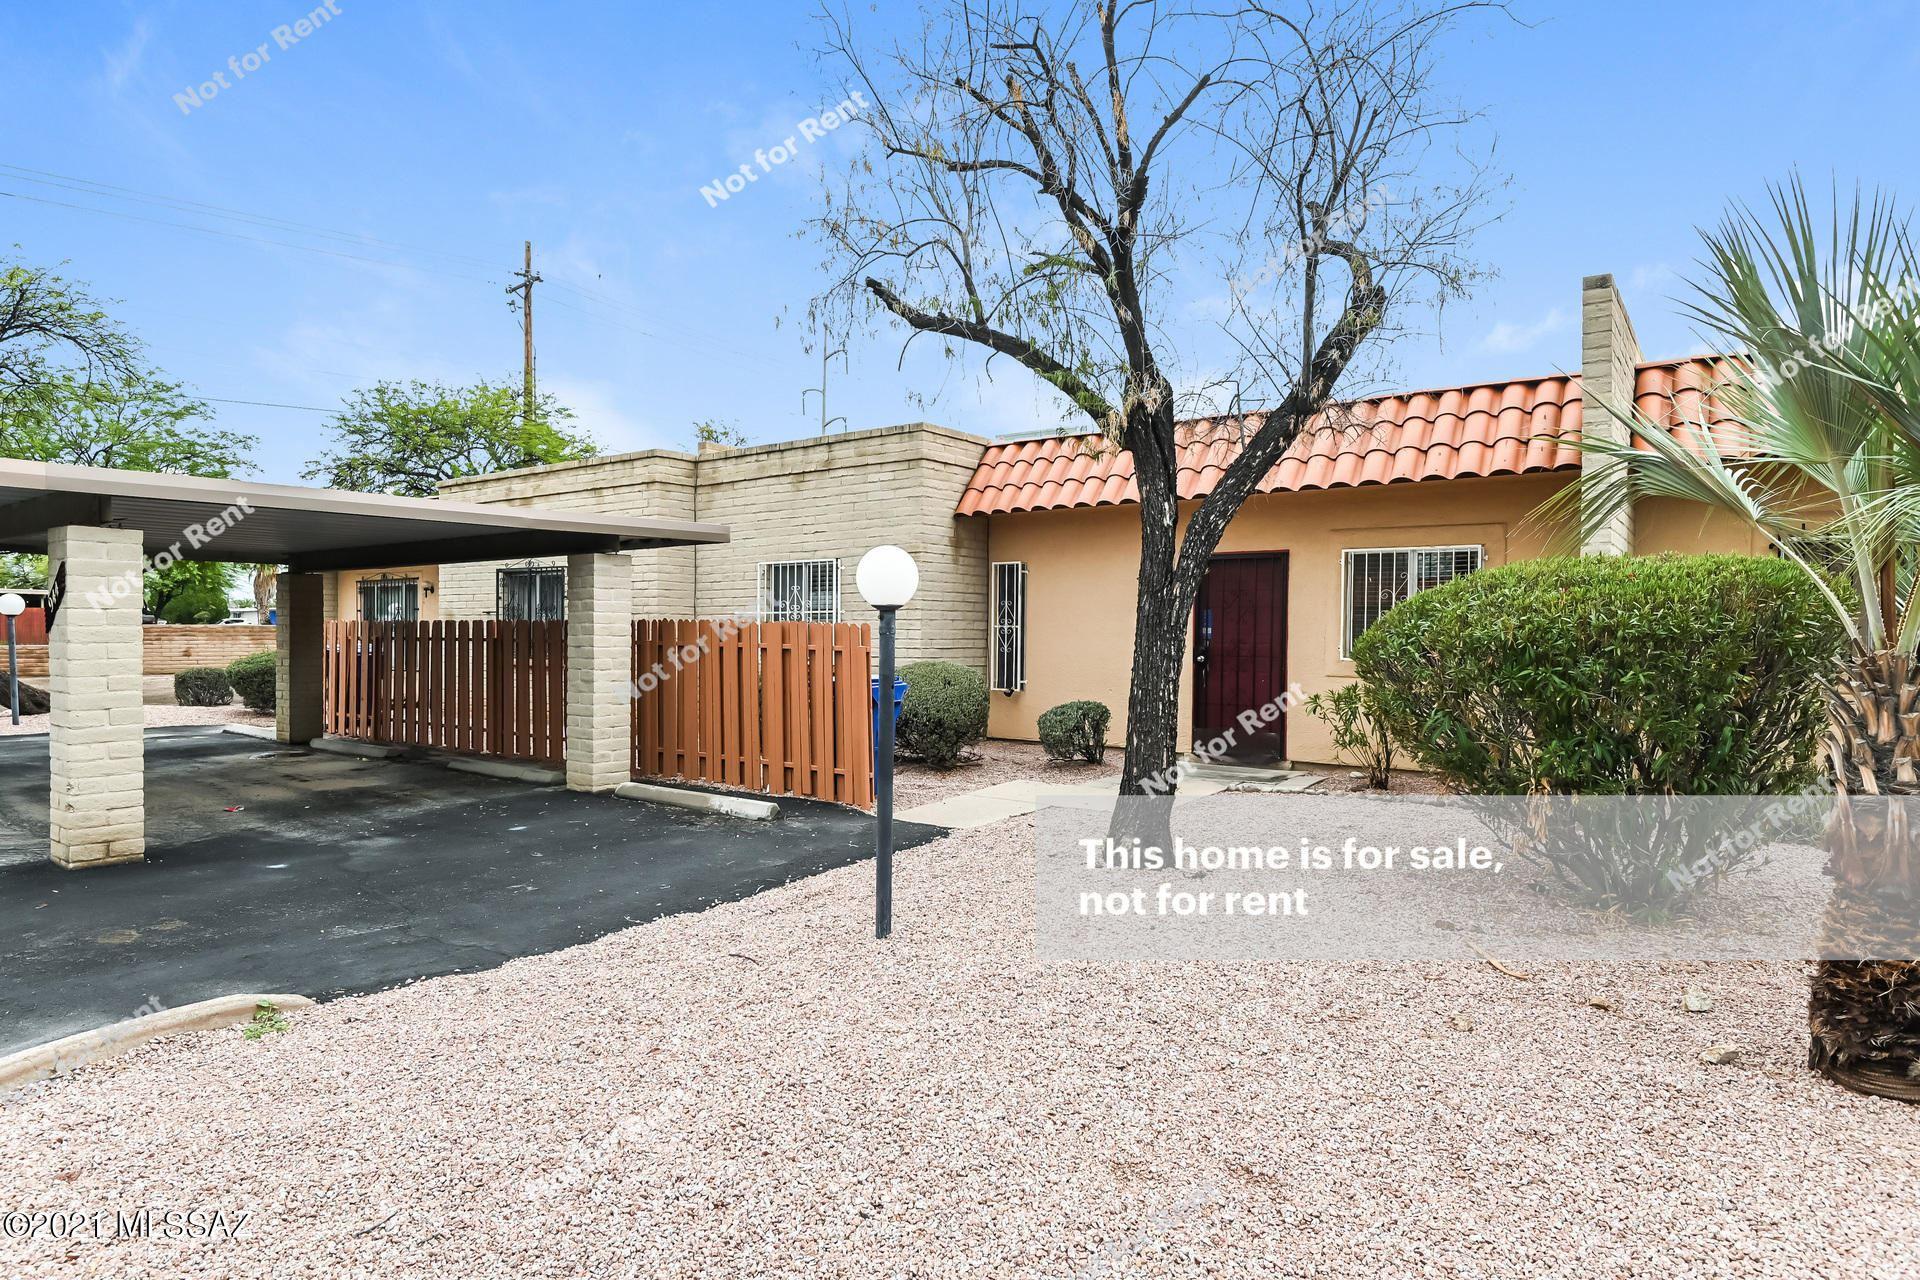 944 S Pantano Road, Tucson, AZ 85710 - MLS#: 22119272